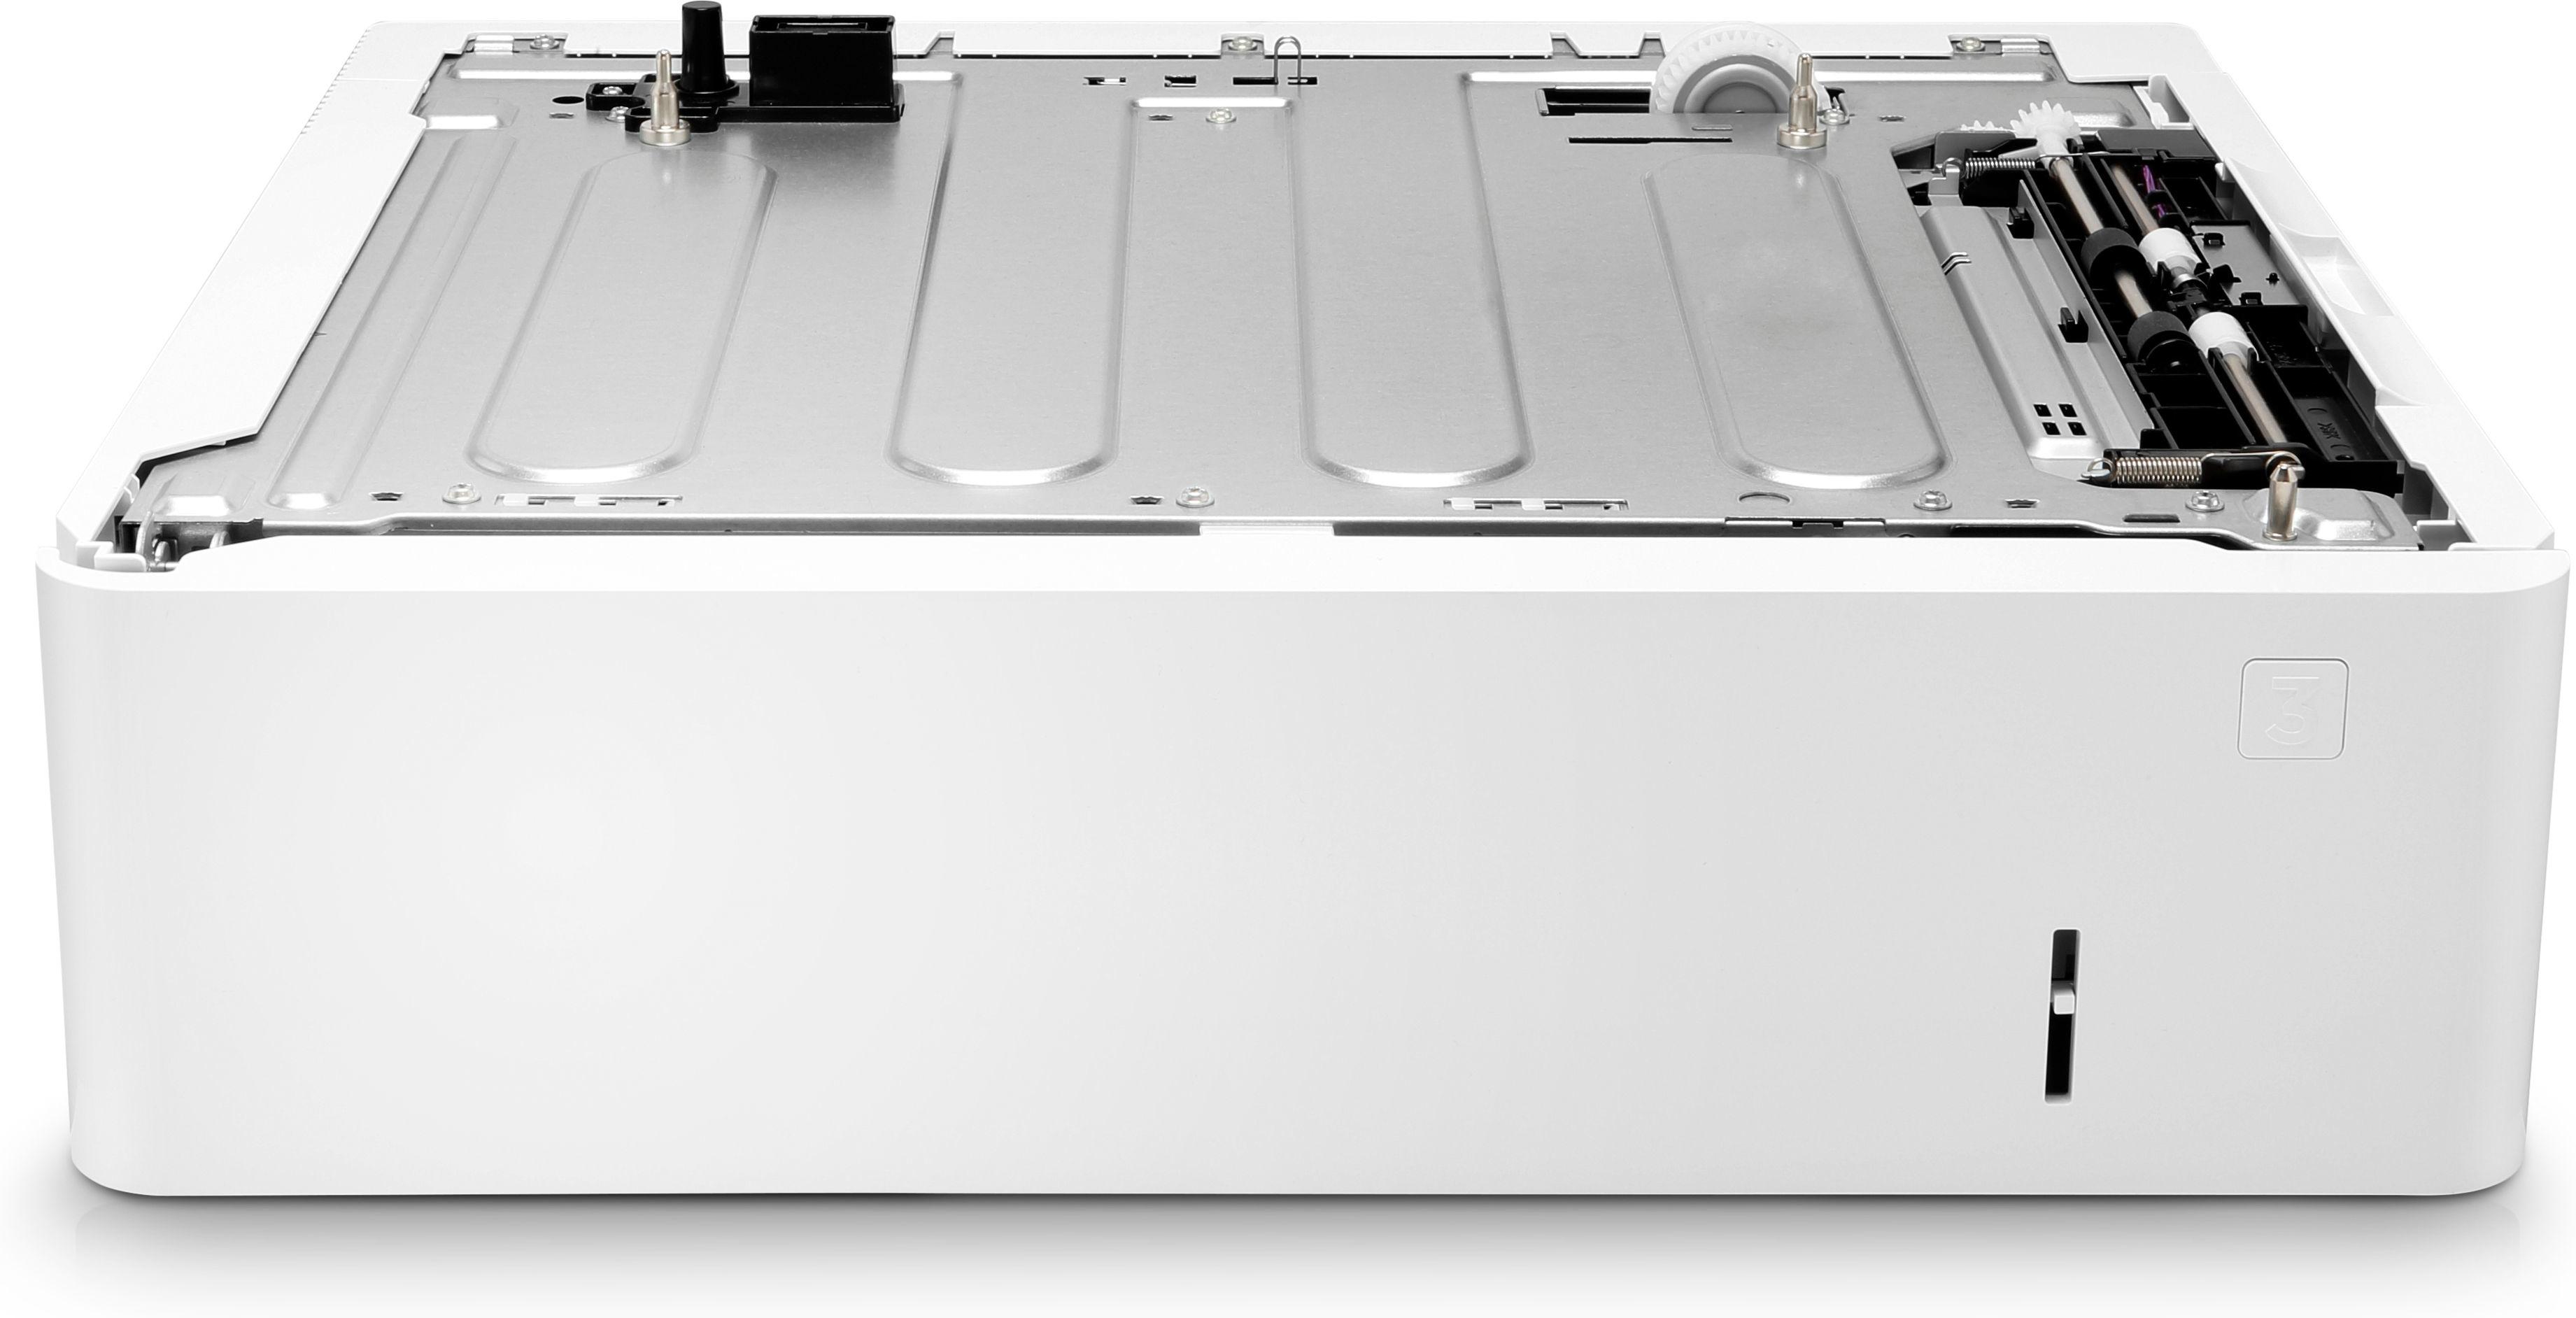 Hp Hp Laserjet 550-sheet Paper Tray - J8j89a - xep01